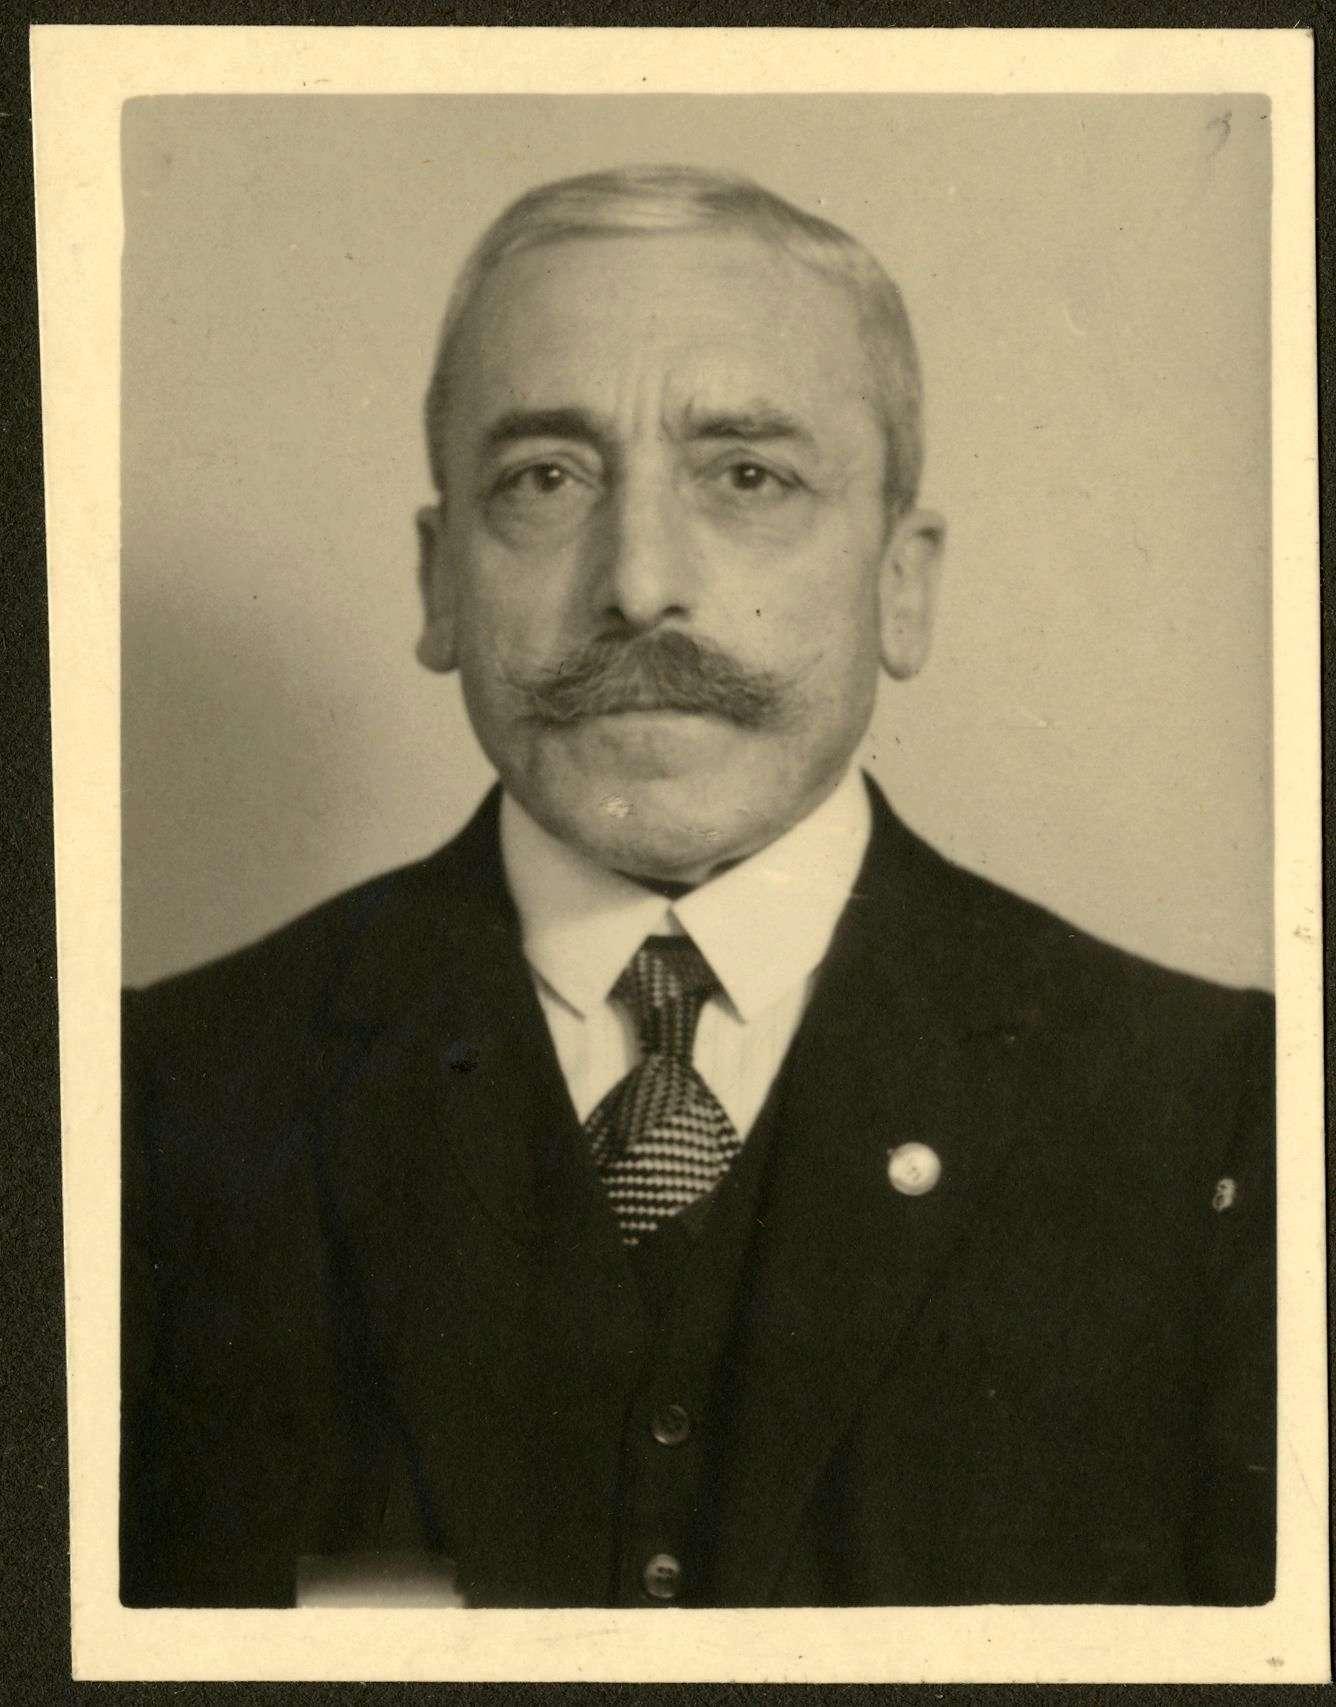 Rümelin, Otto, Bild 2